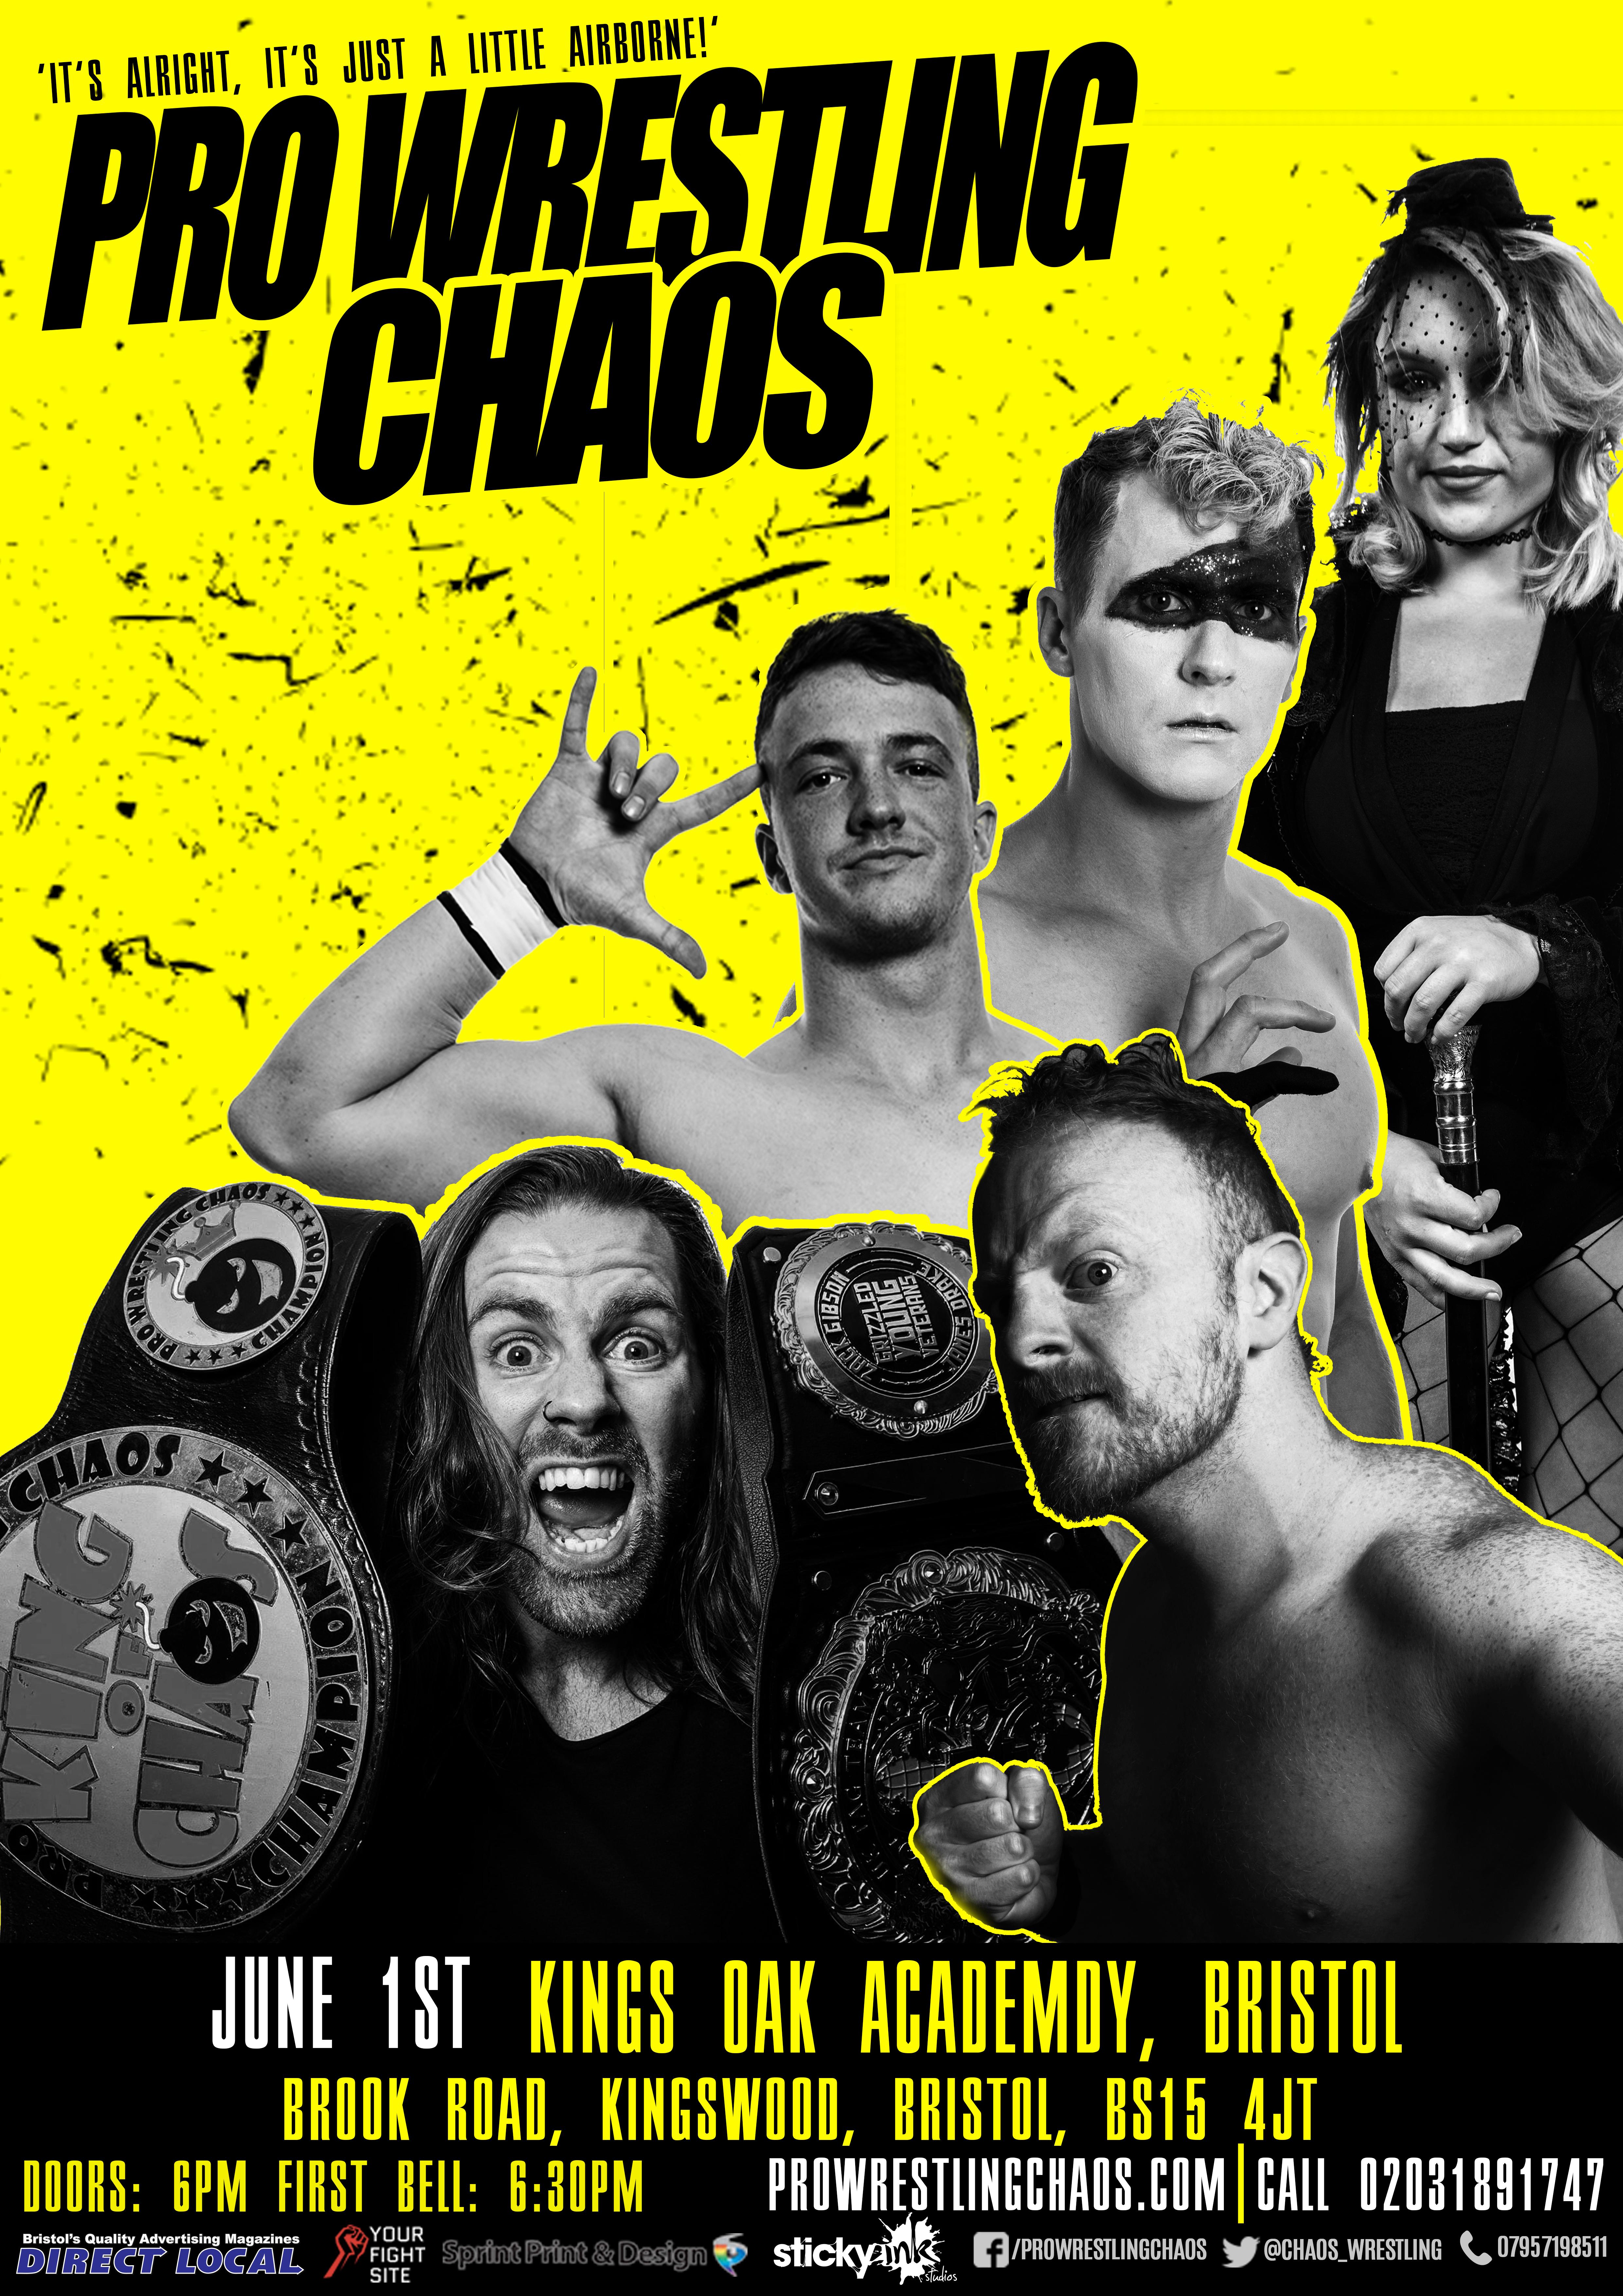 Pro Wrestling Chaos: It's alright, it's just a little airborne  event description image